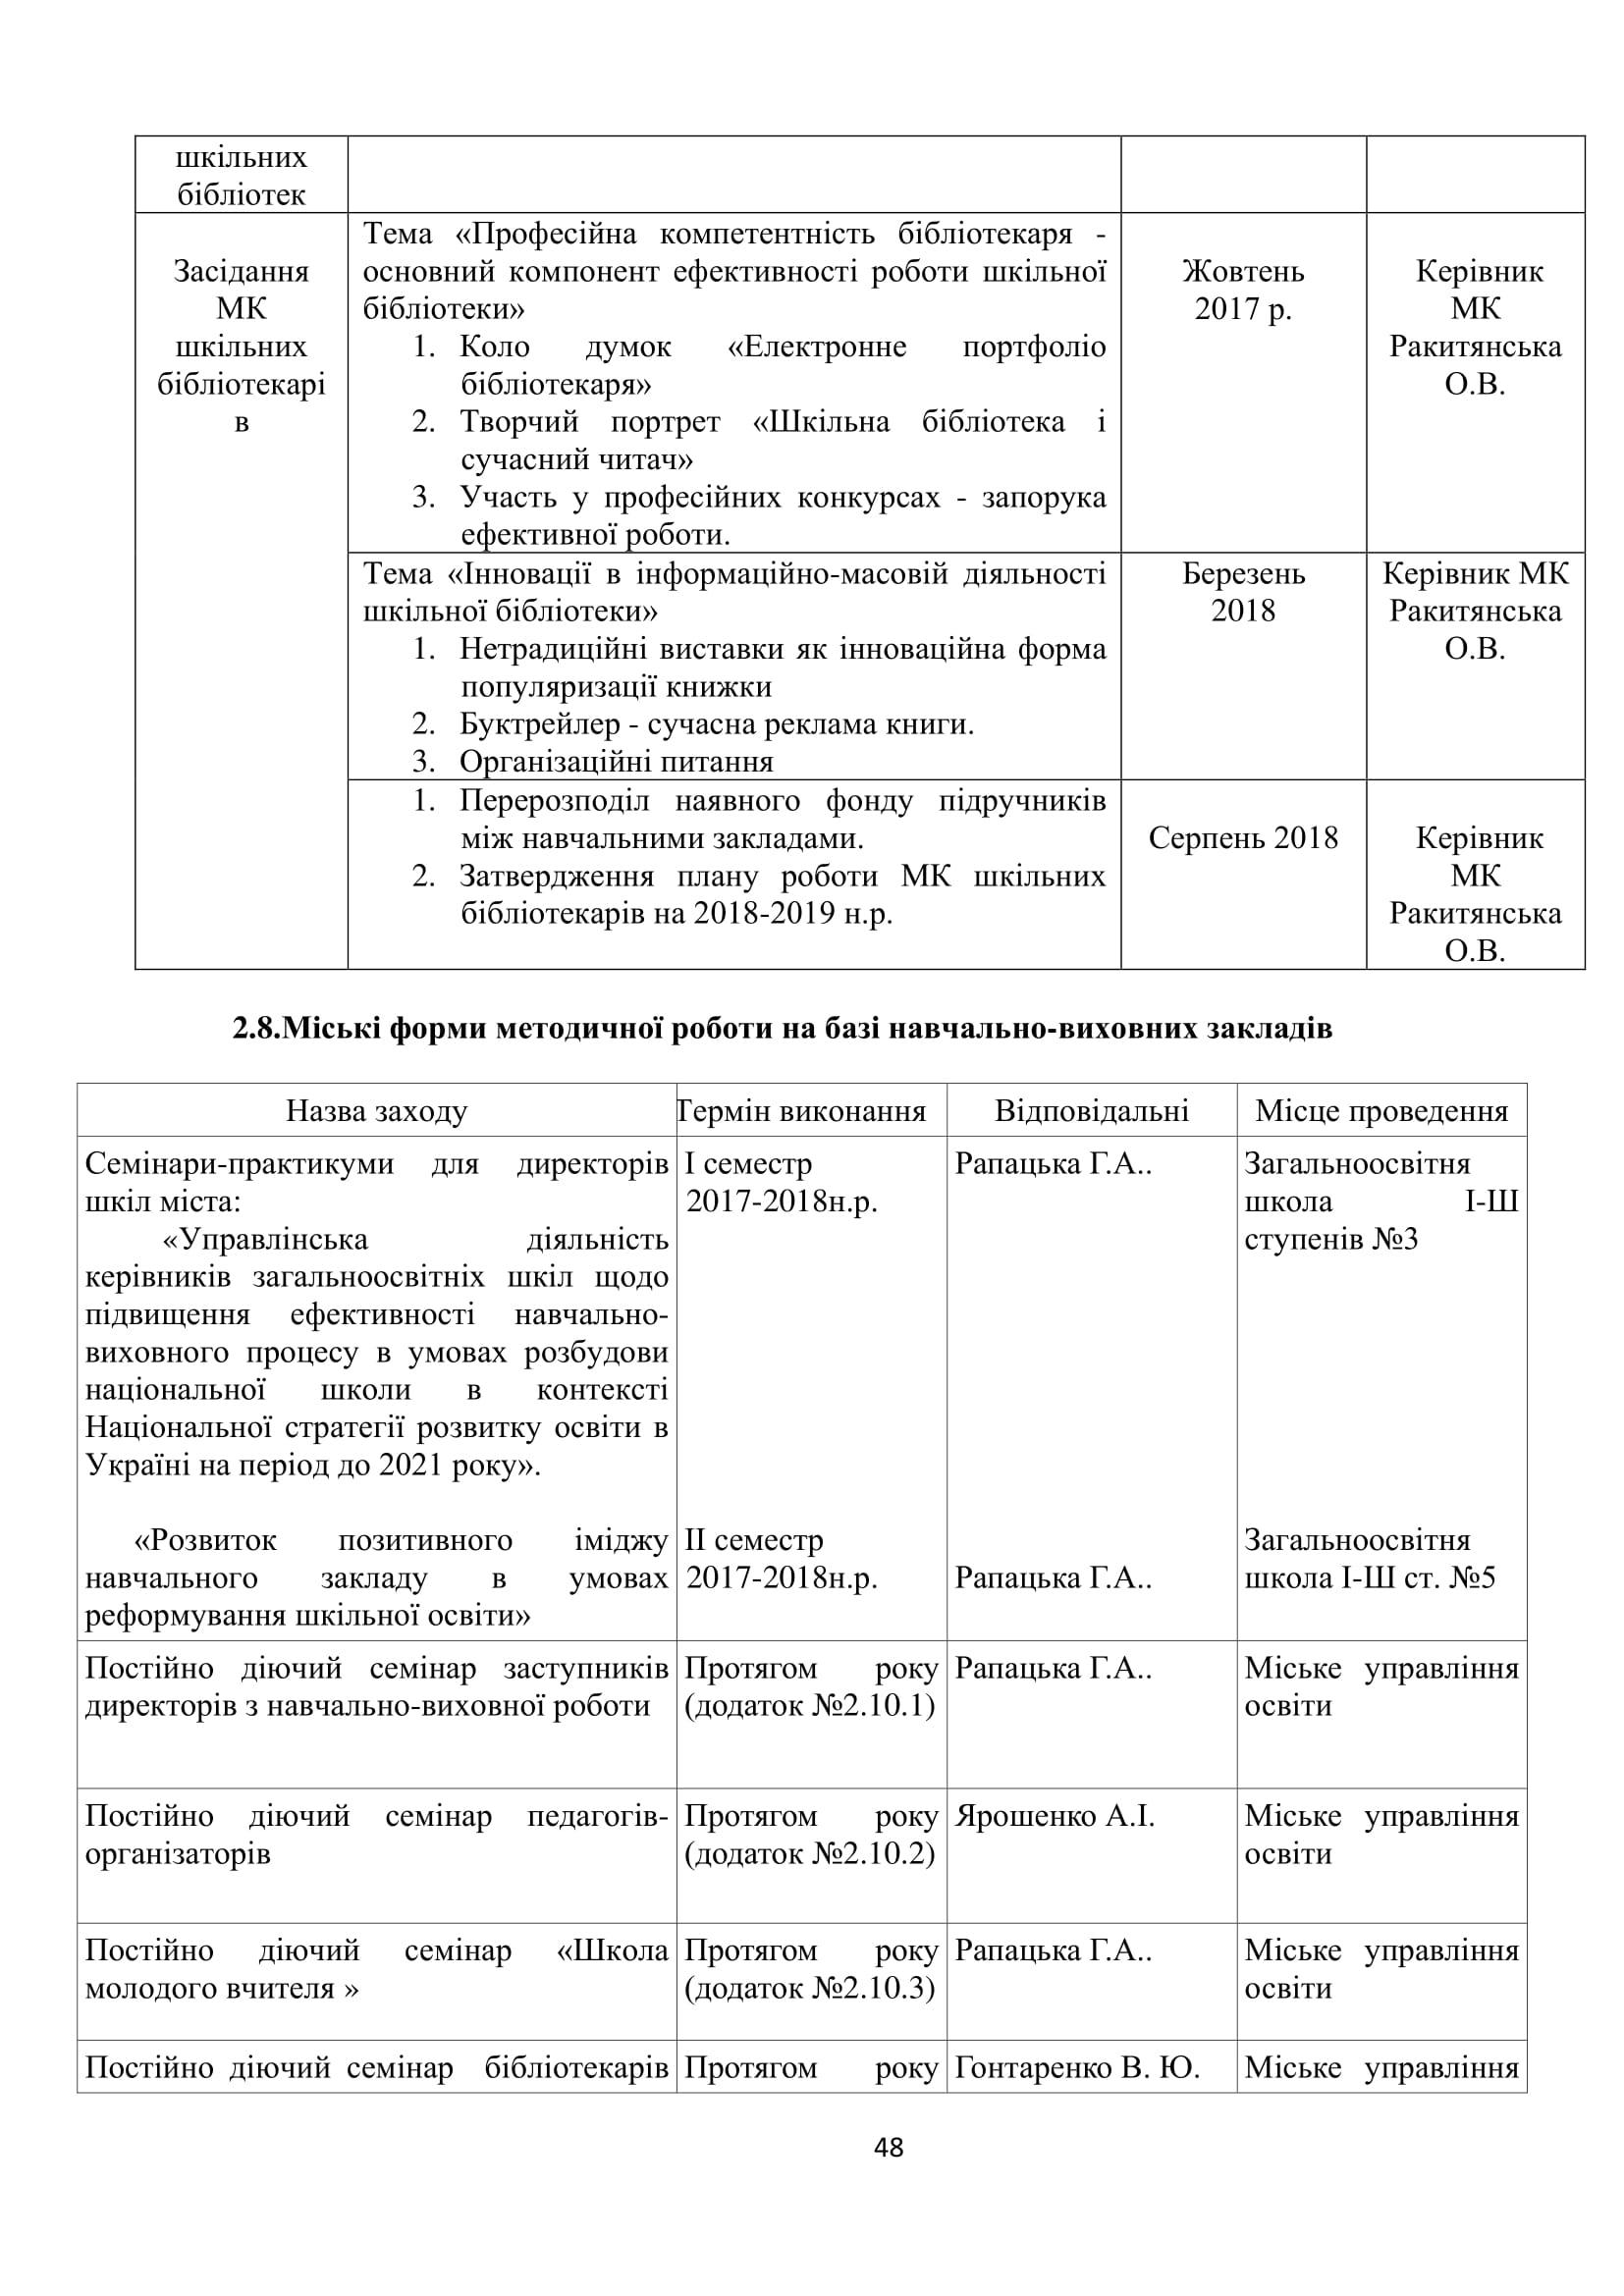 2017-2018 - ММК план роботи-49